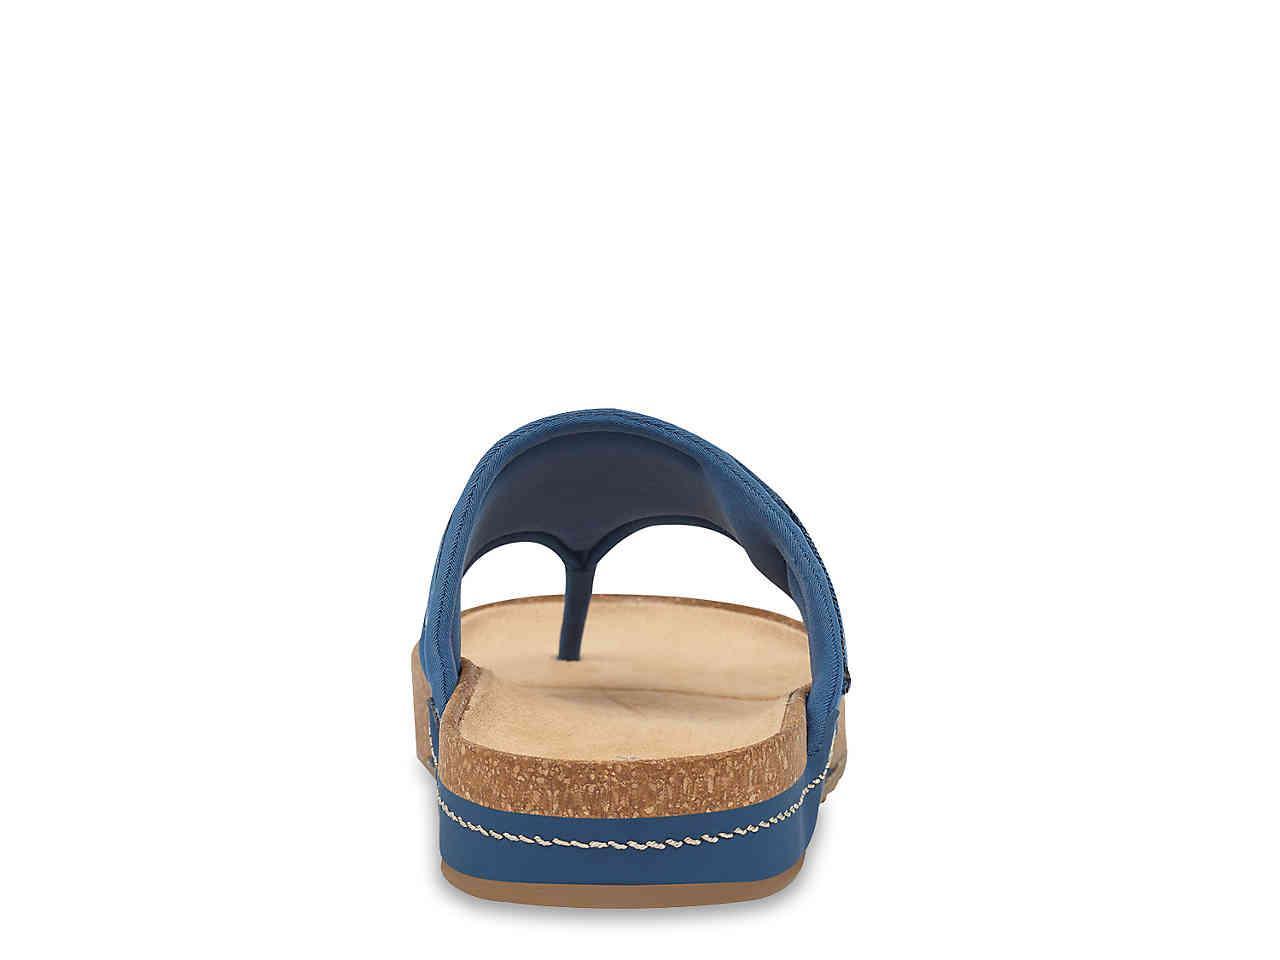 e5dc8db13a32 Easy Spirit - Blue Peony Sandal - Lyst. View fullscreen